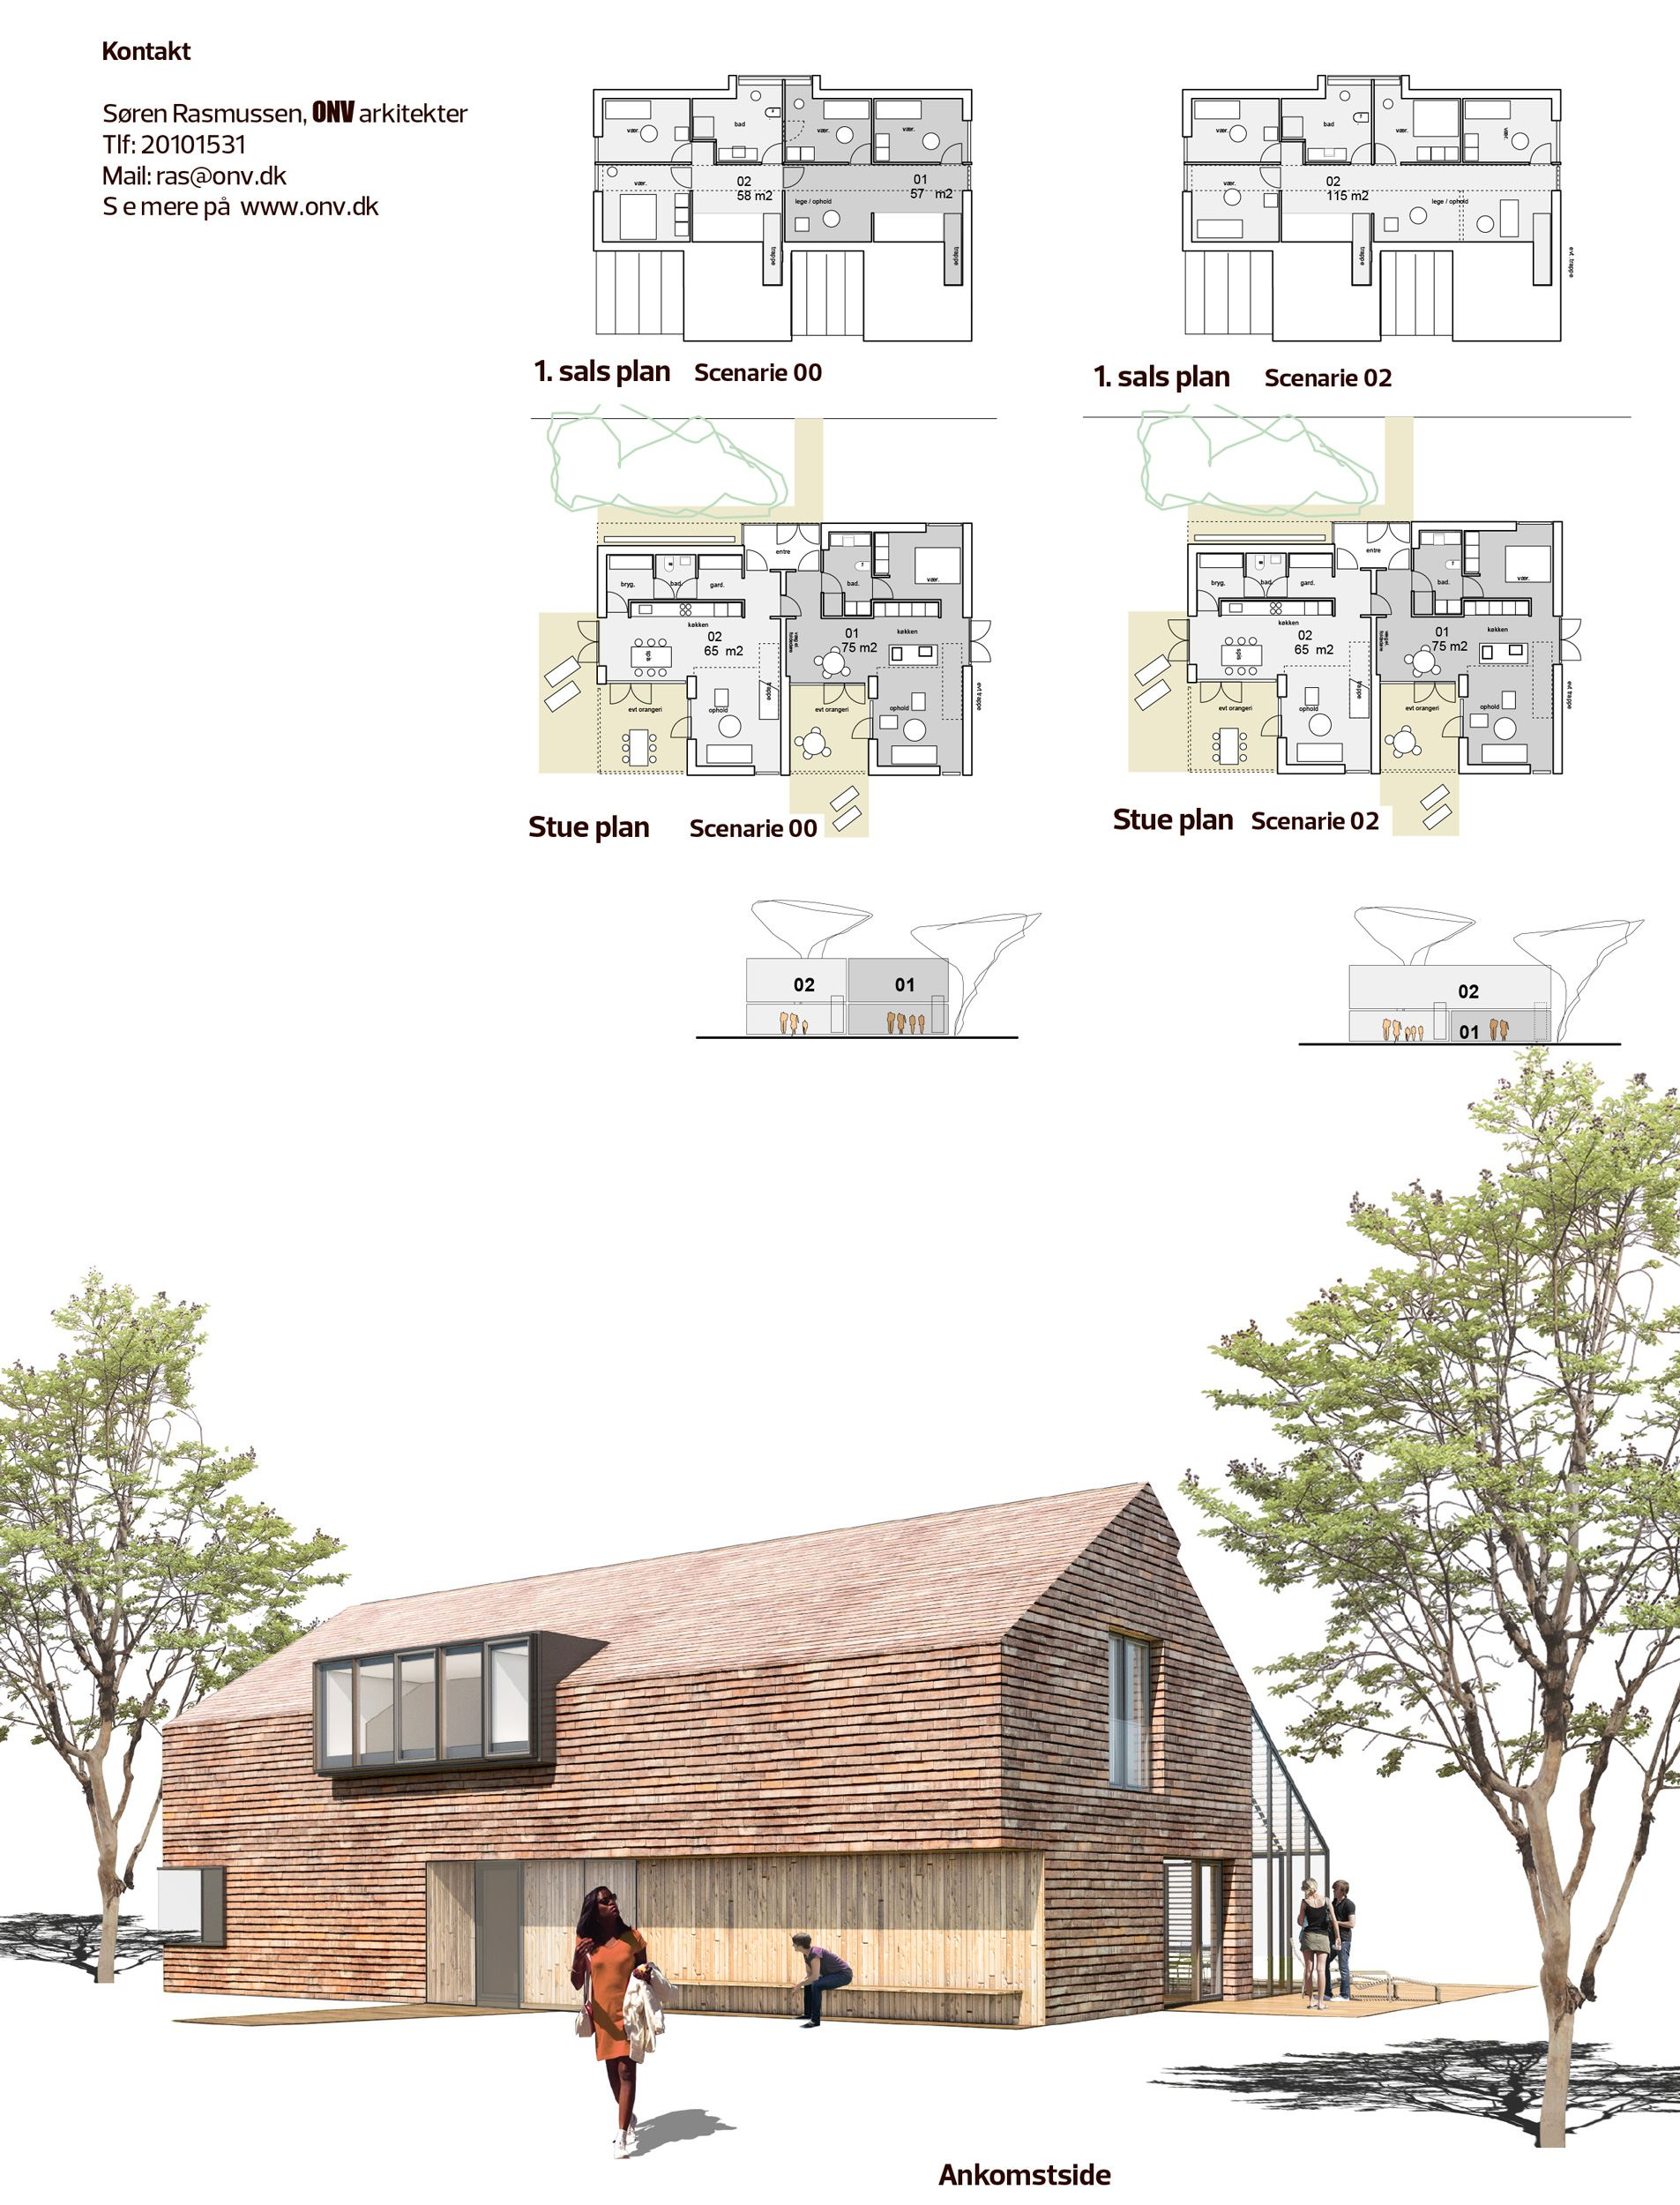 Generationsboligen-typehus-det-fleksible-hus-ONV-arkitekter-04